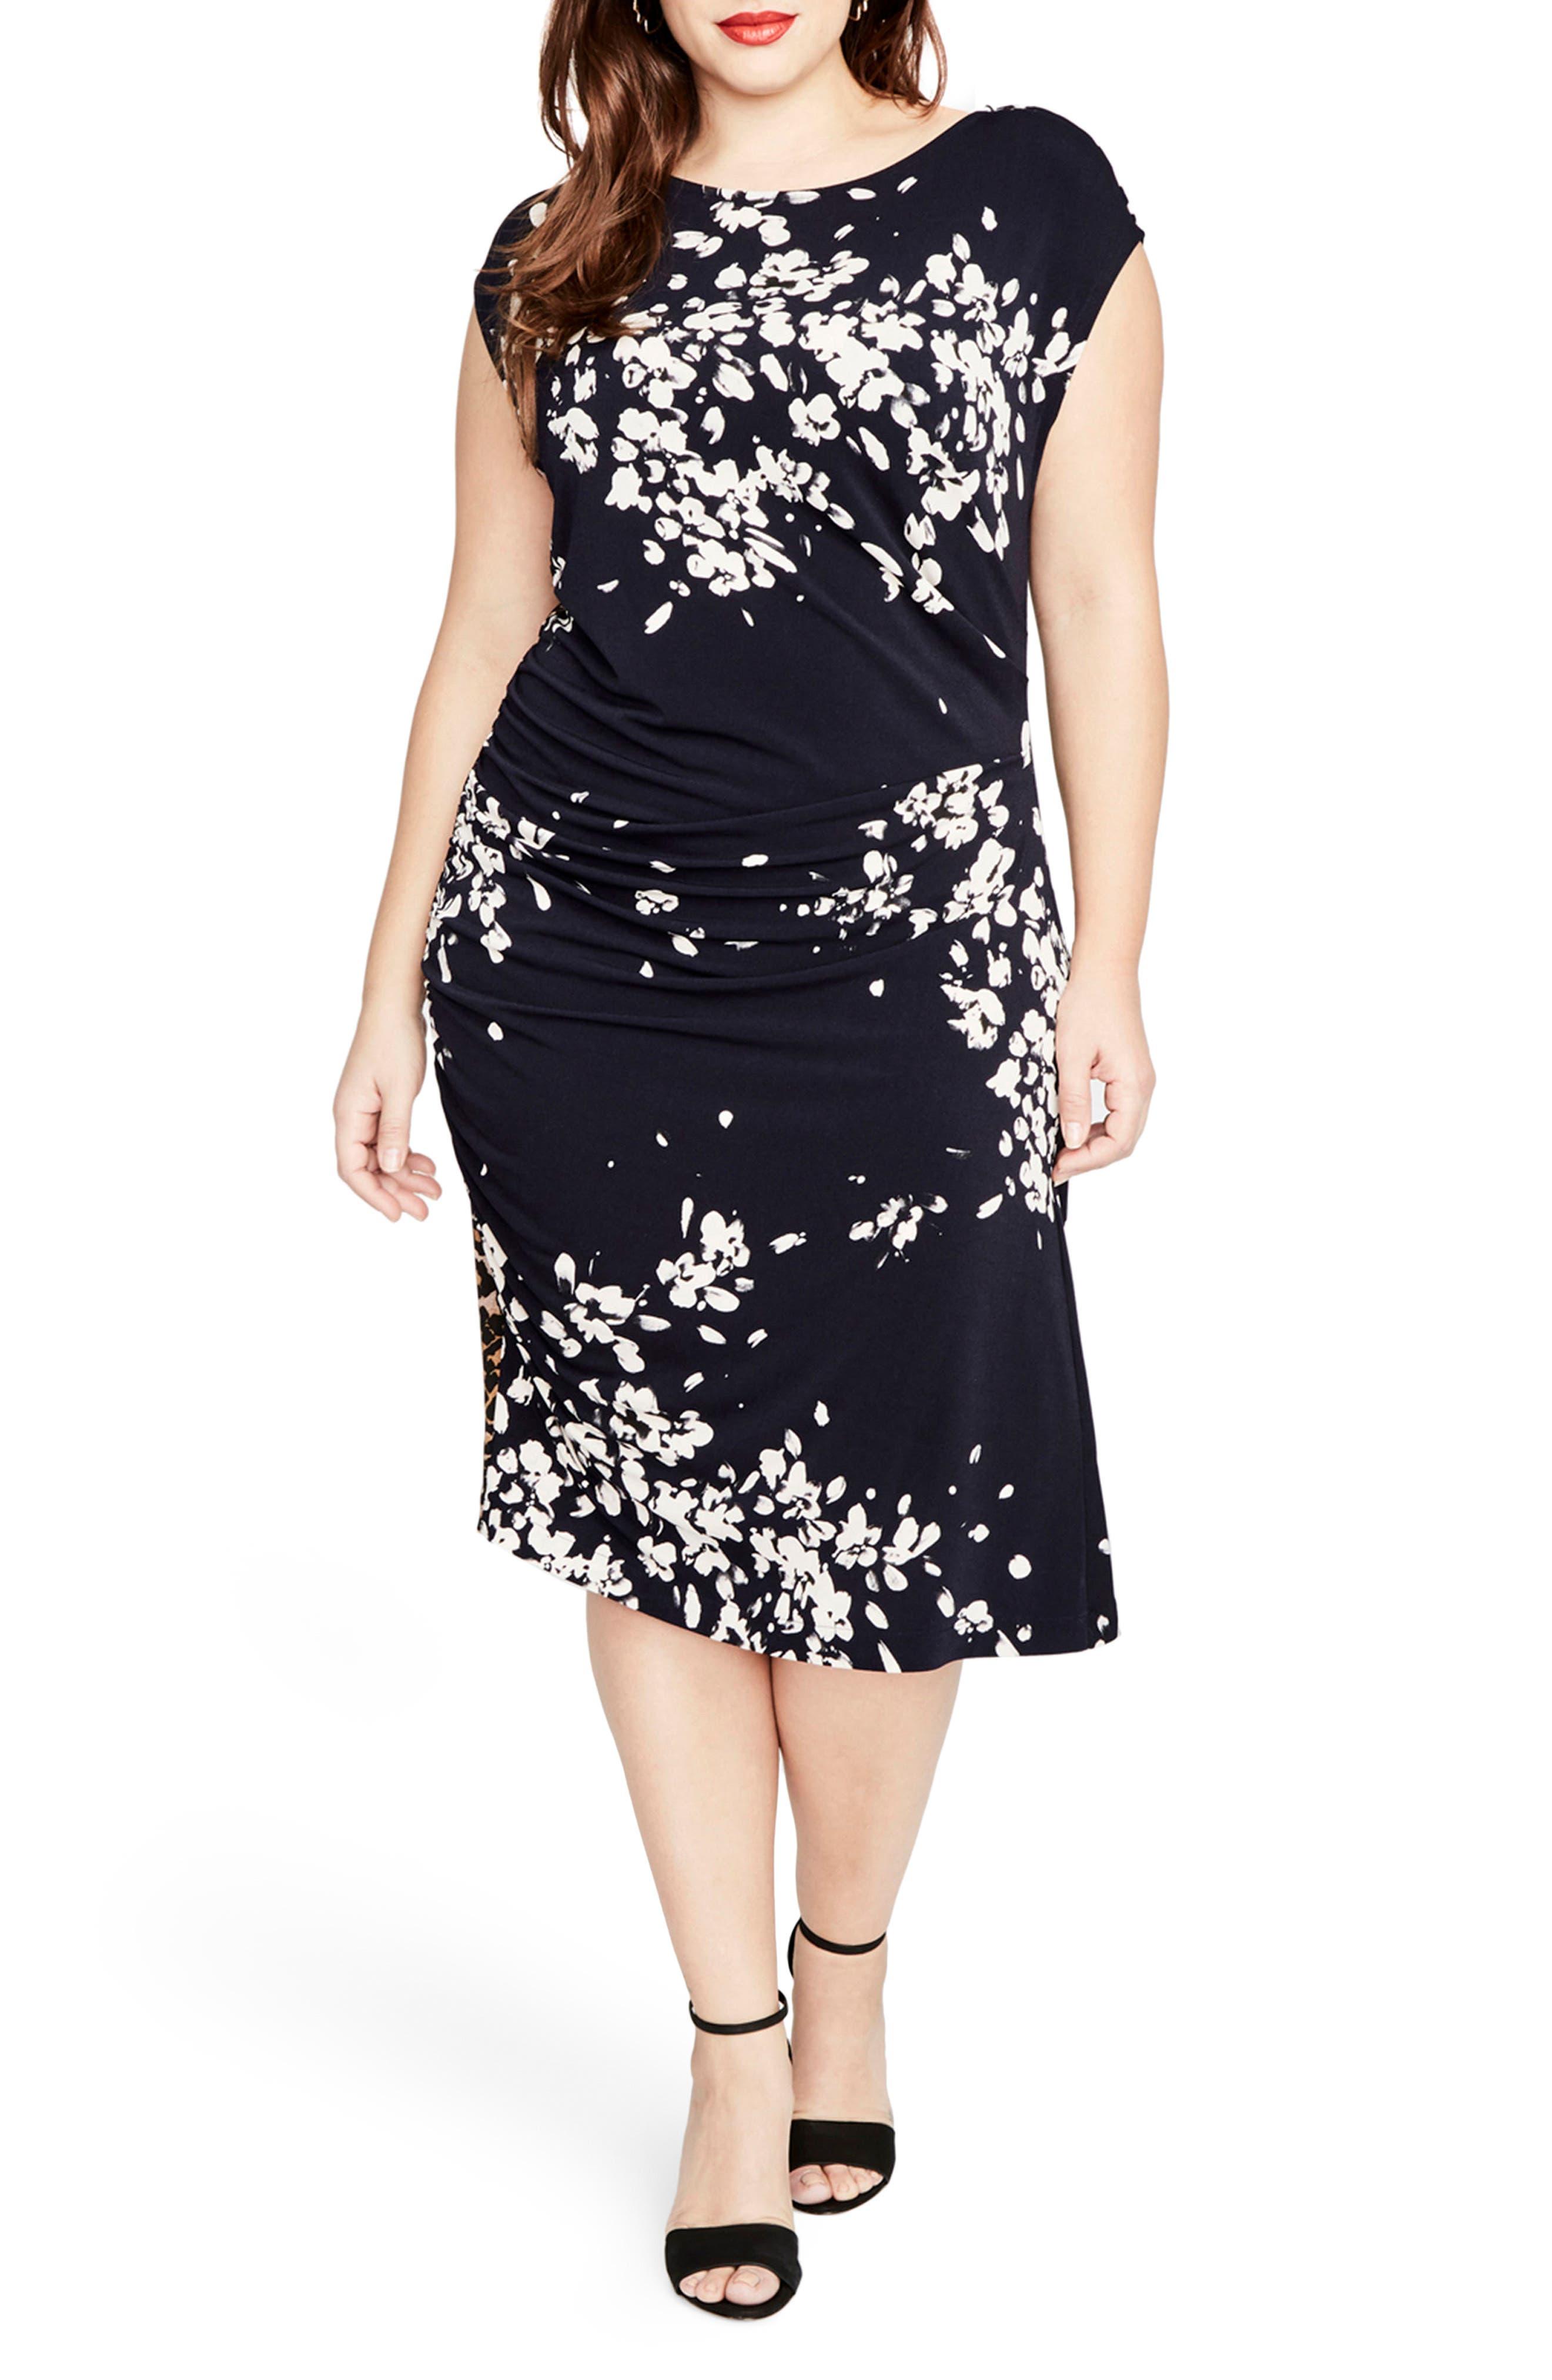 RACHEL BY Rachel Roy Asymmetrical Floral Dress,                         Main,                         color, Navy Combo